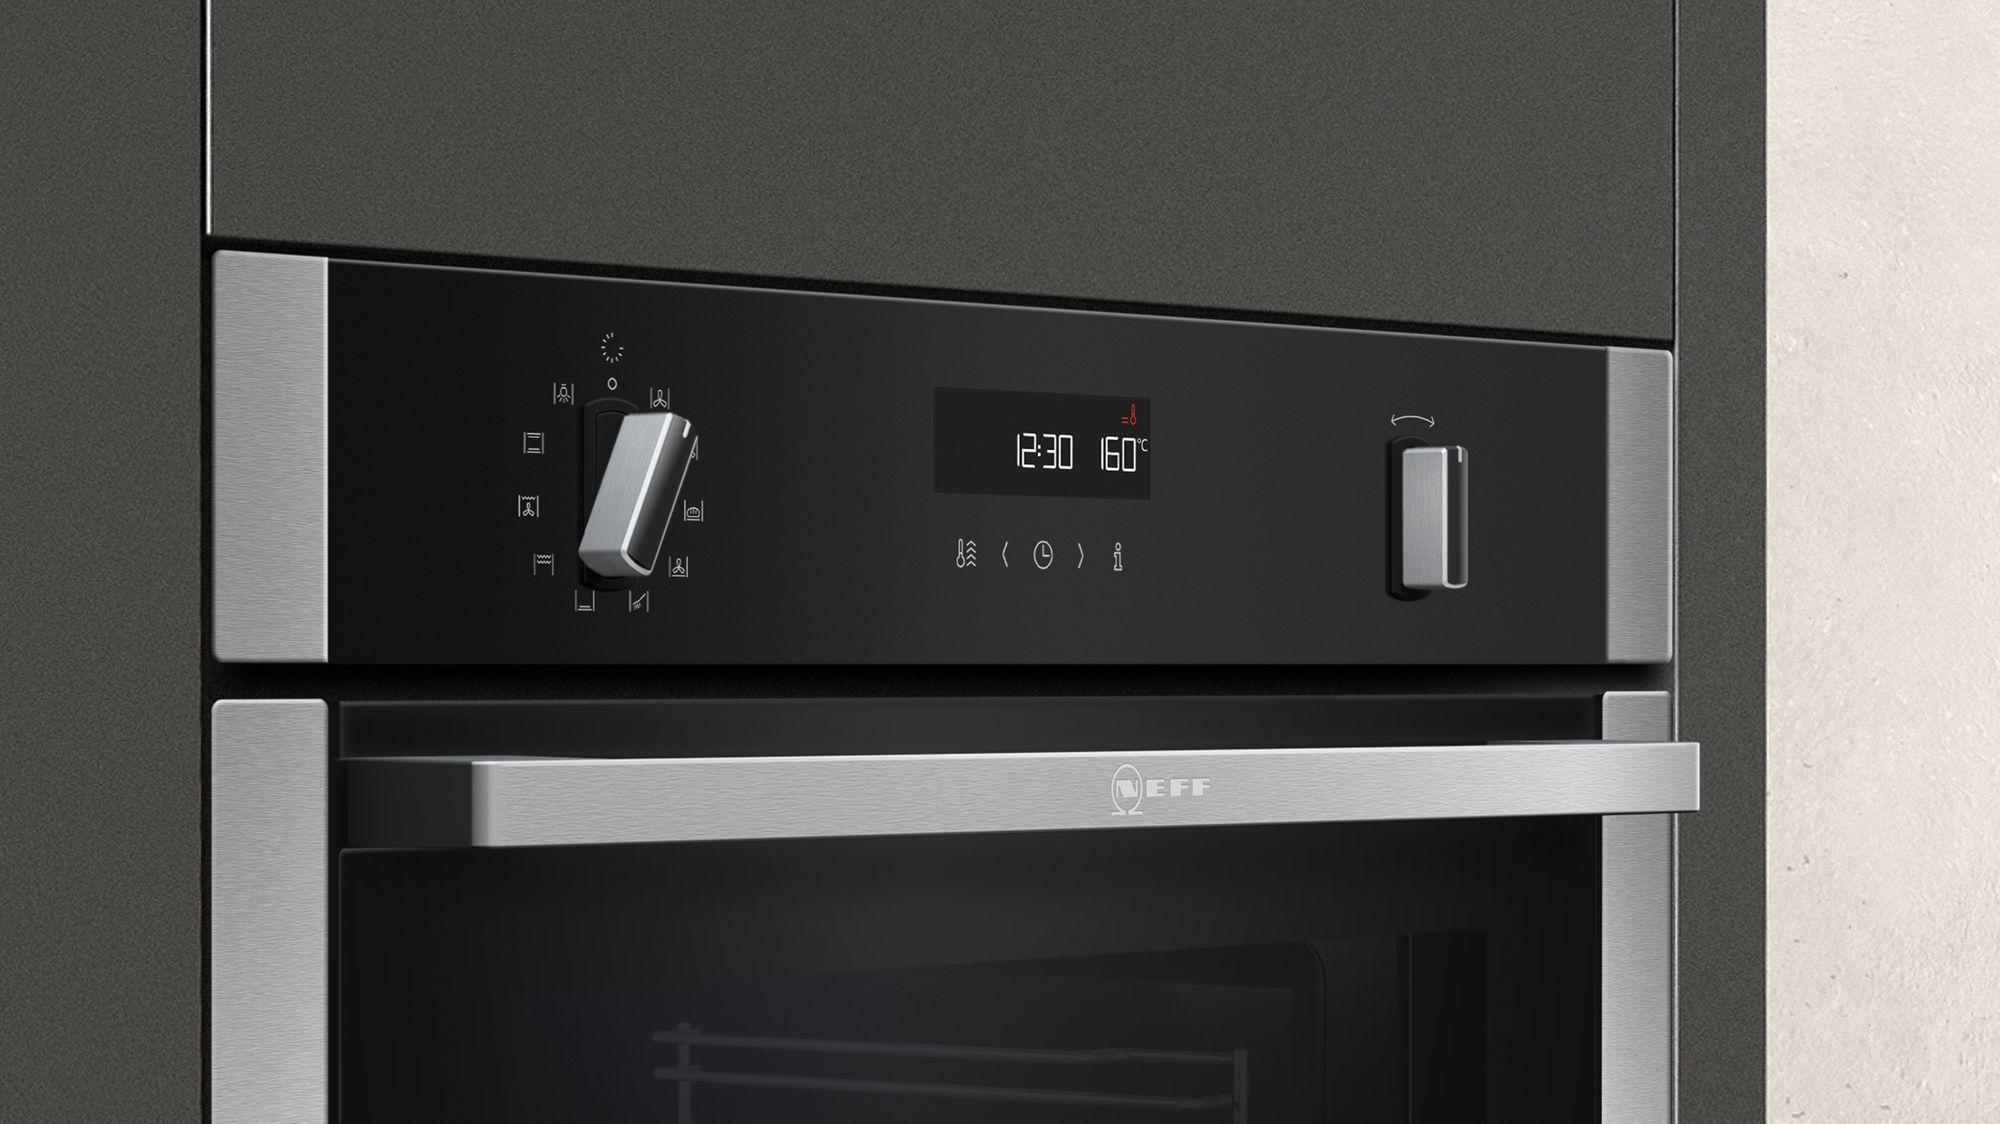 Neff Double Oven With Slide And Hide Door Sliding Designs